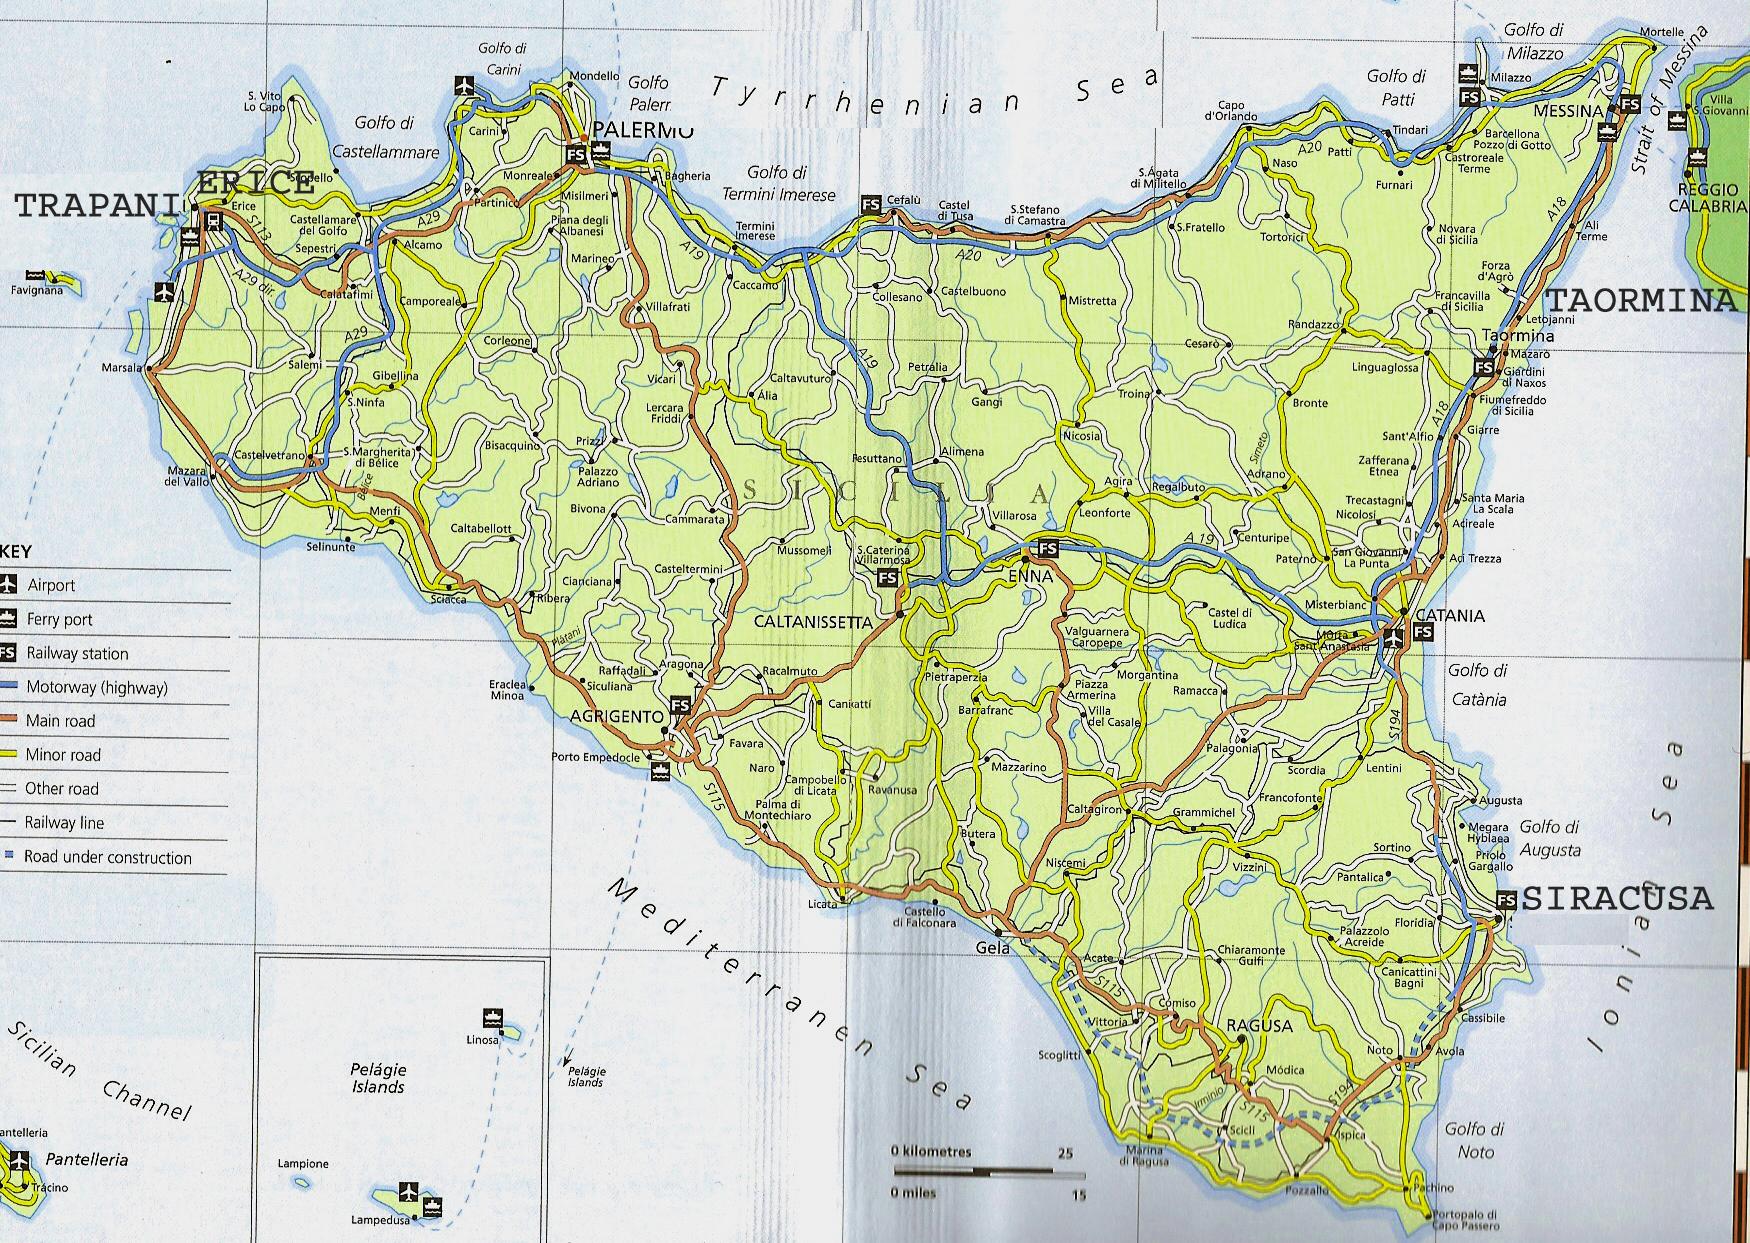 Sicily Tourist Map Sicily mappery – Sicily Tourist Map